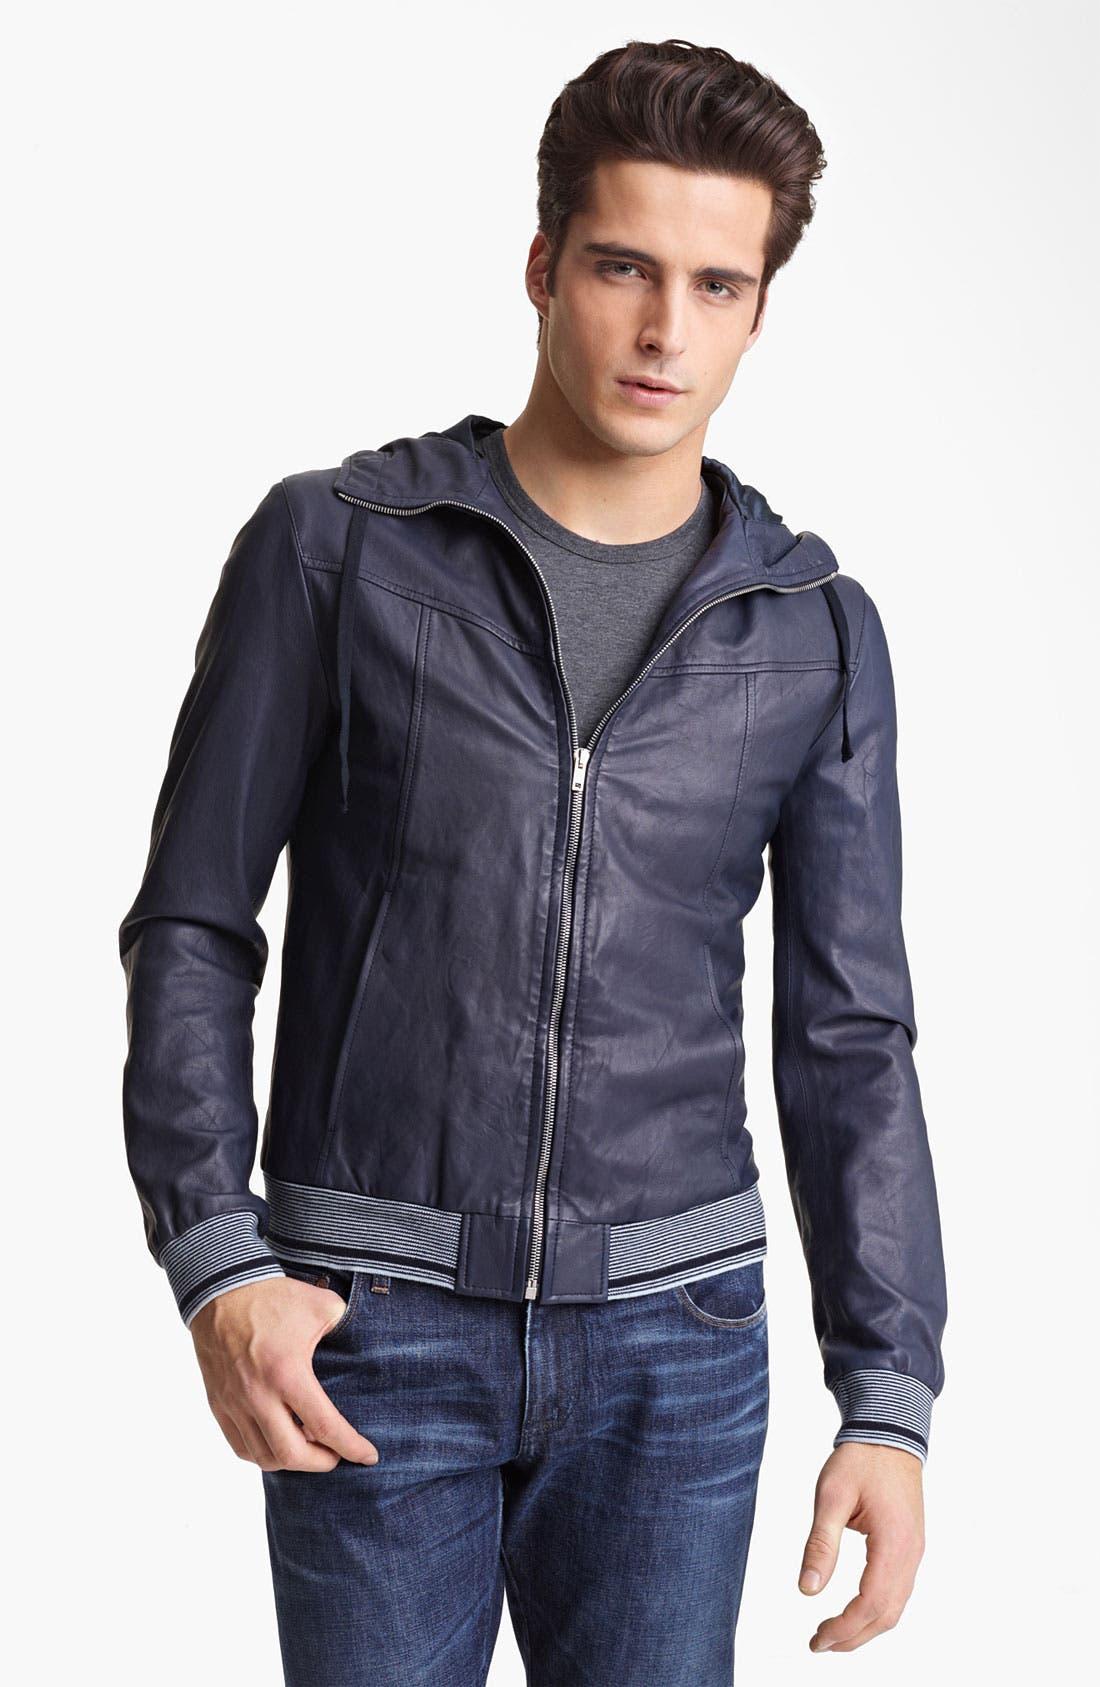 Alternate Image 1 Selected - Dolce&Gabbana Hooded Leather Jacket